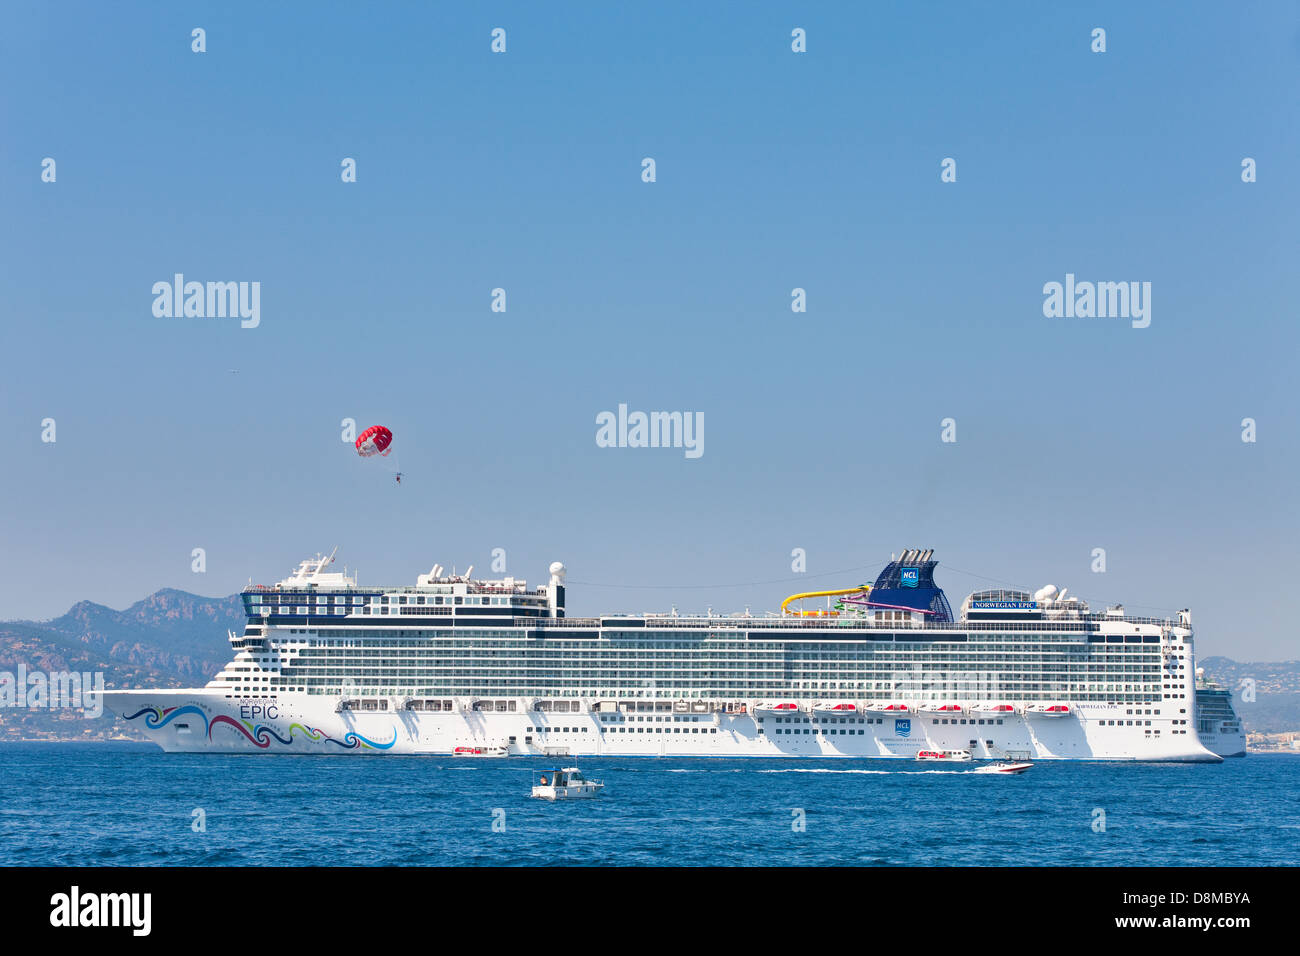 Norwegian Cruise Epic Stock Photos Amp Norwegian Cruise Epic Stock Images Alamy